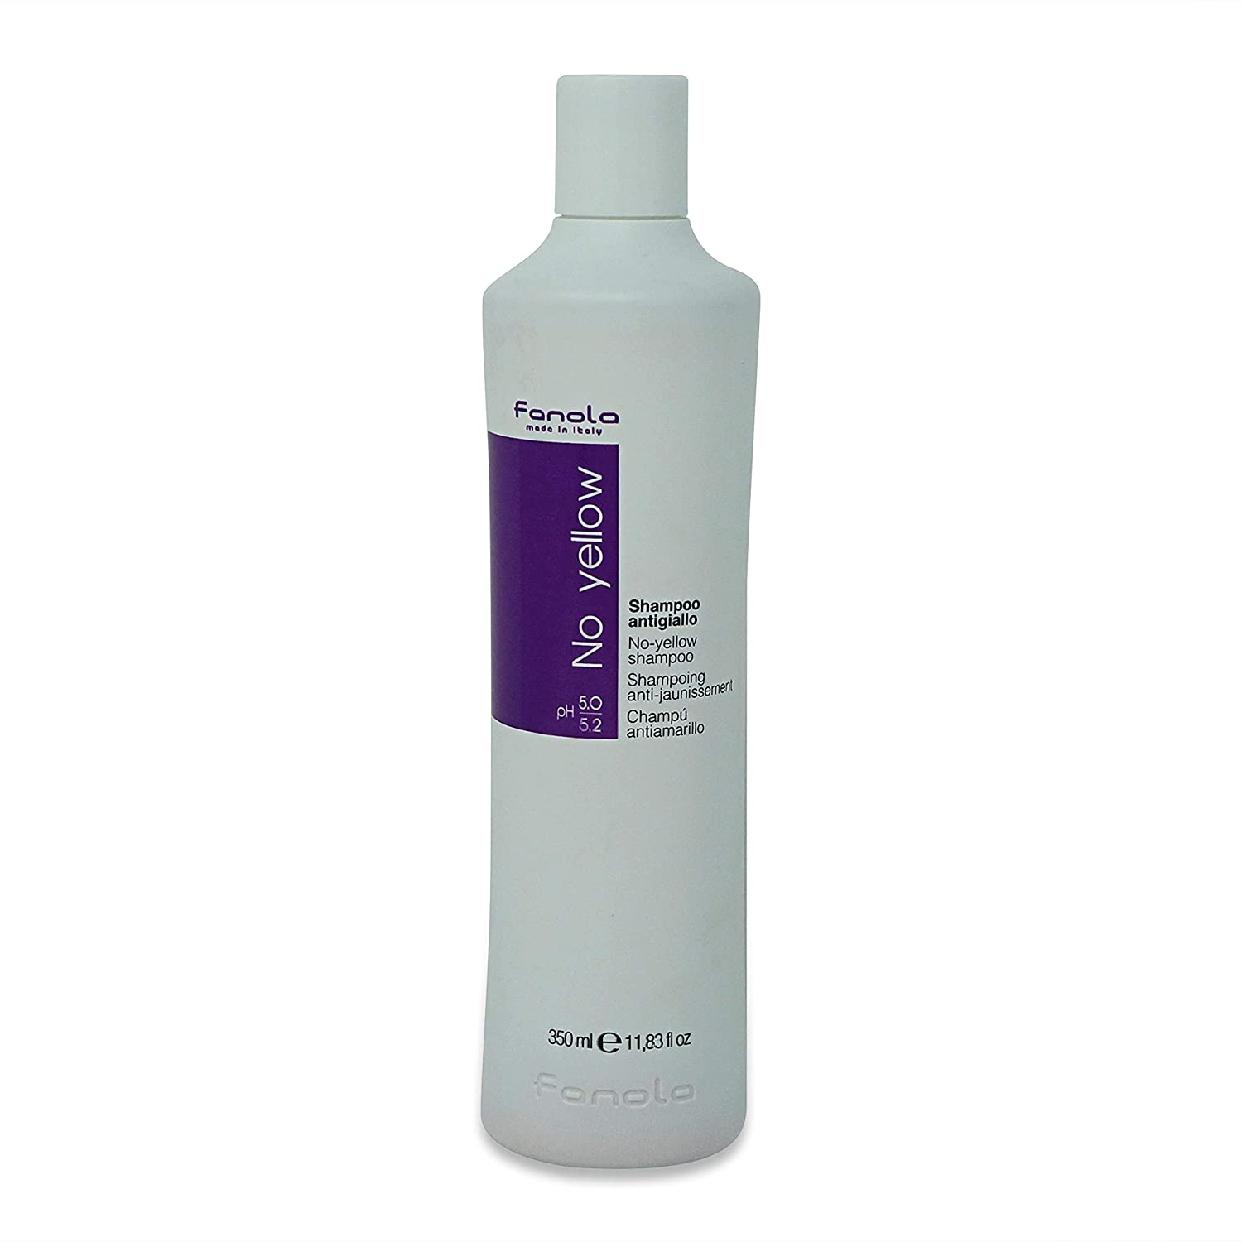 Fanola(ファノラ)Fanola No Yellow Shampooの商品画像4